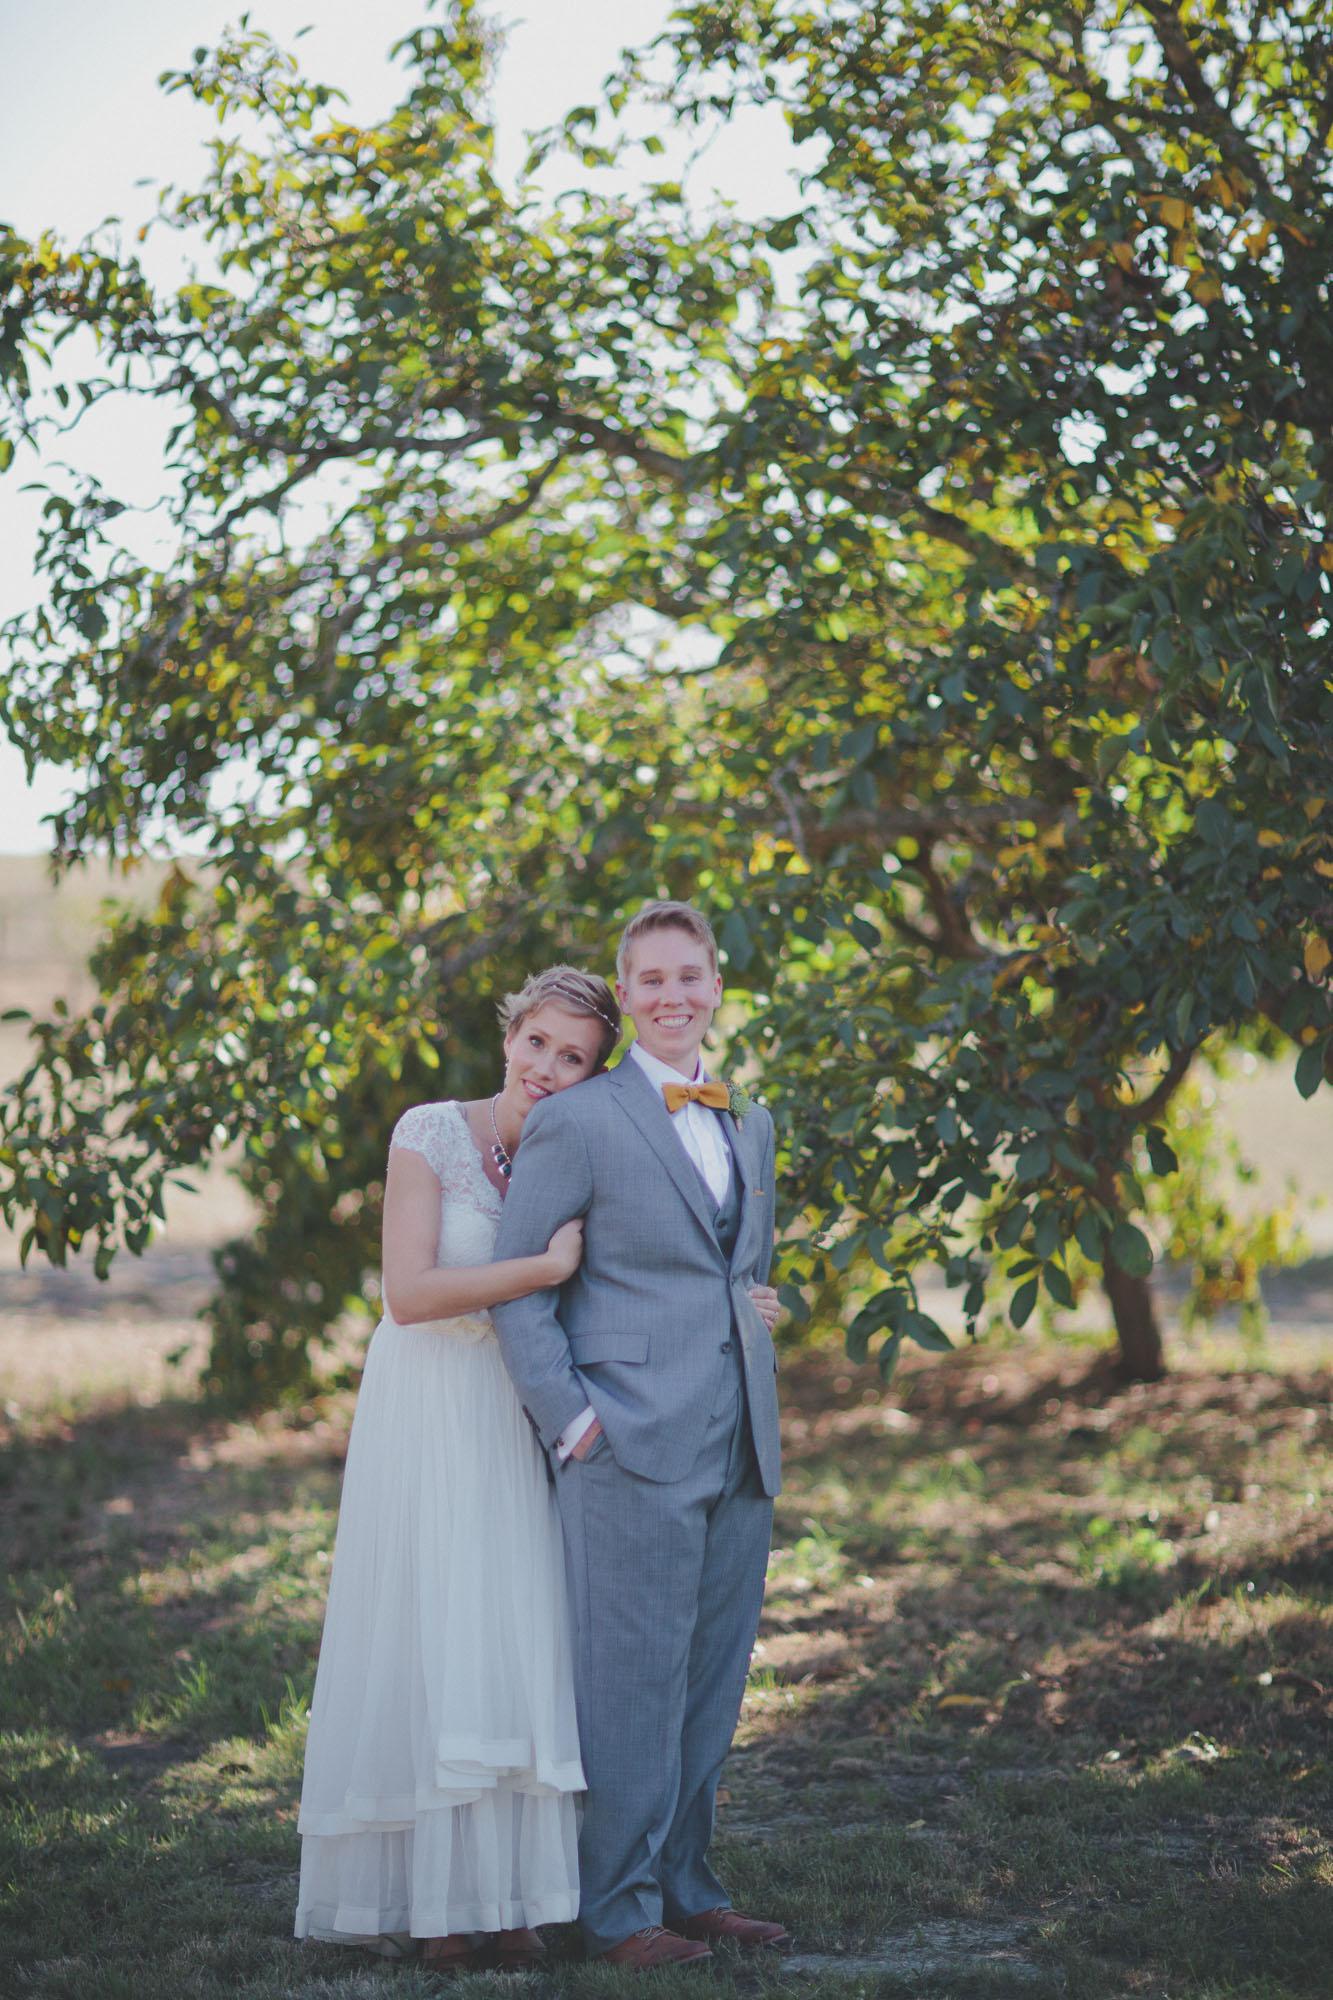 Gretchen_Gause_Petaluma_Olympias_Valley_Wedding_Photo-102.jpg